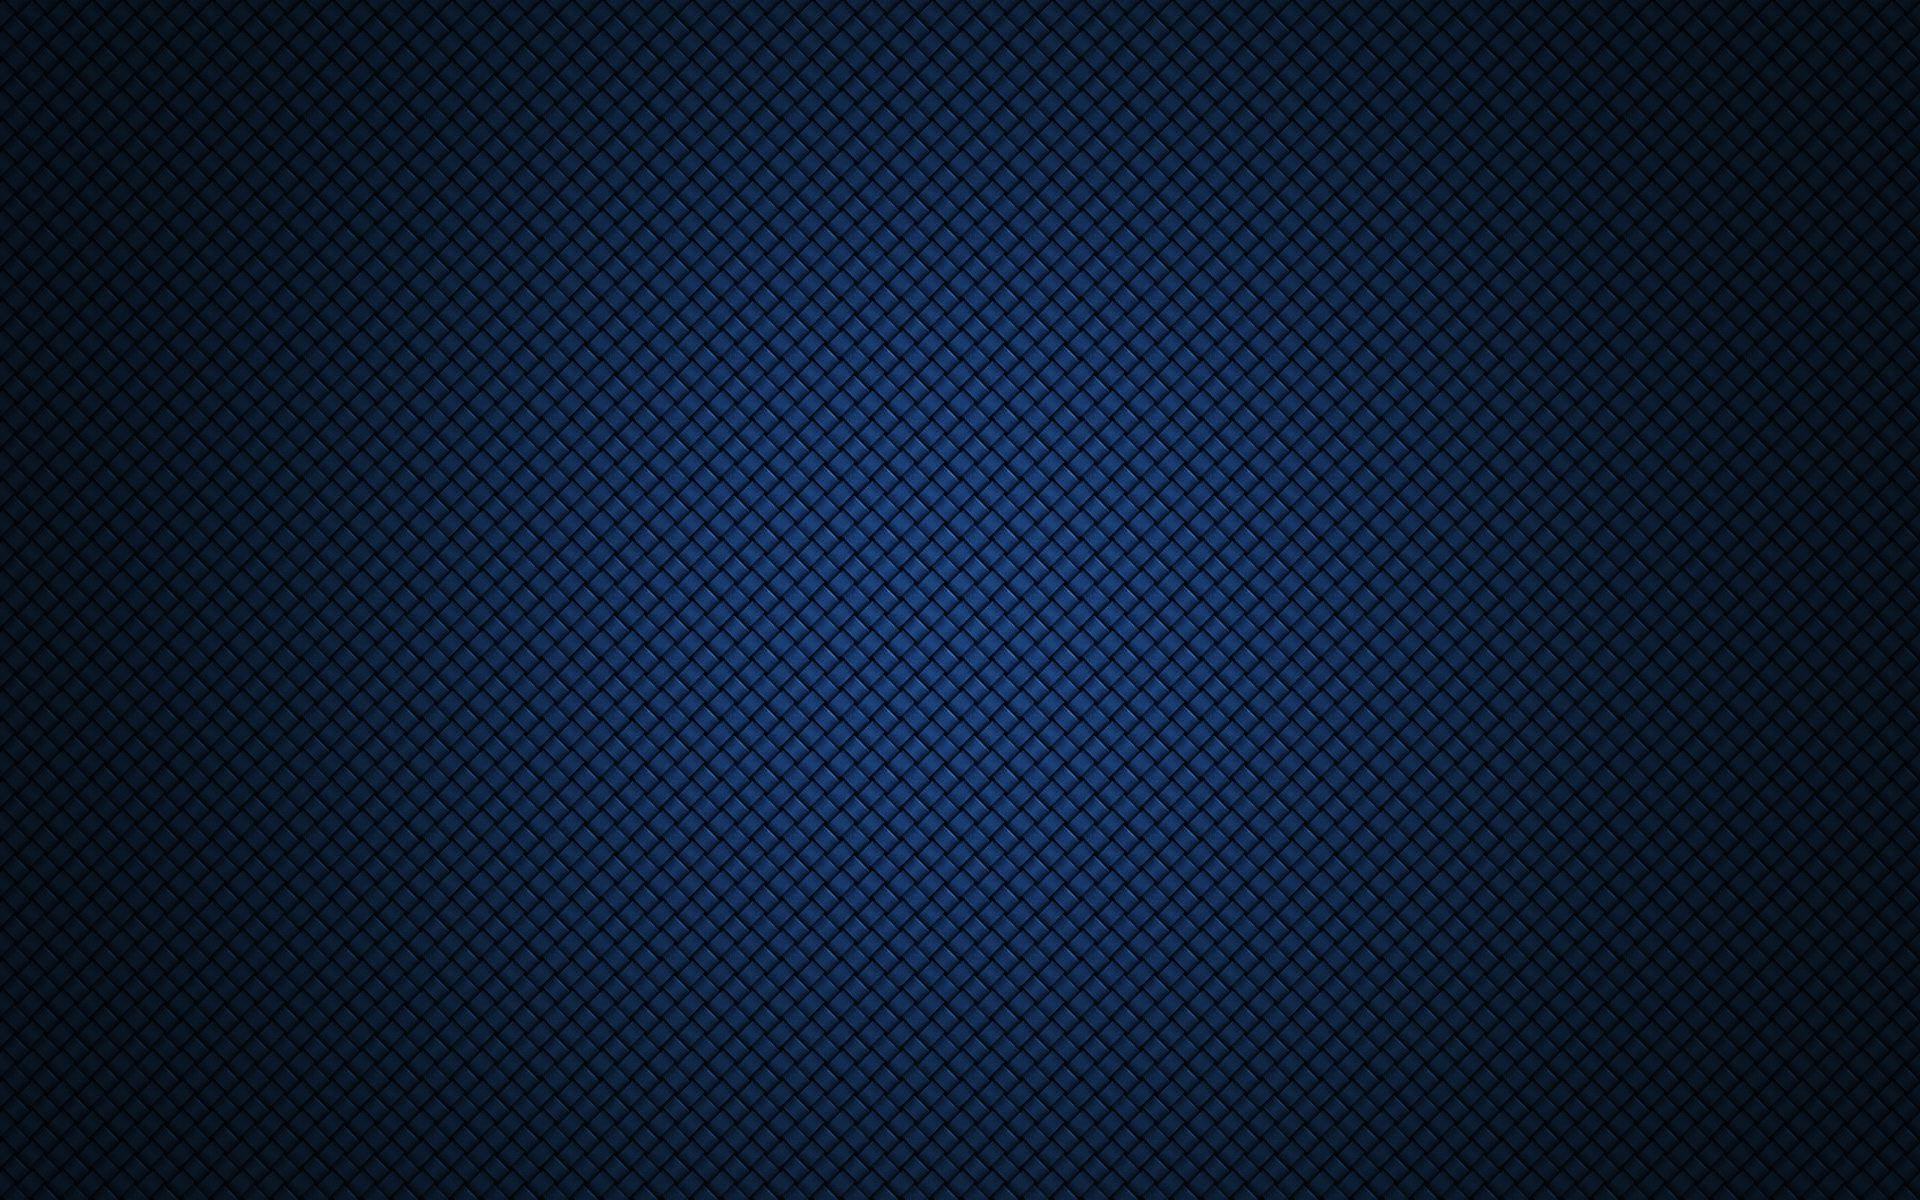 Dark blue checks plain HD wallpapers HD Wallpapers Rocks 1920x1200